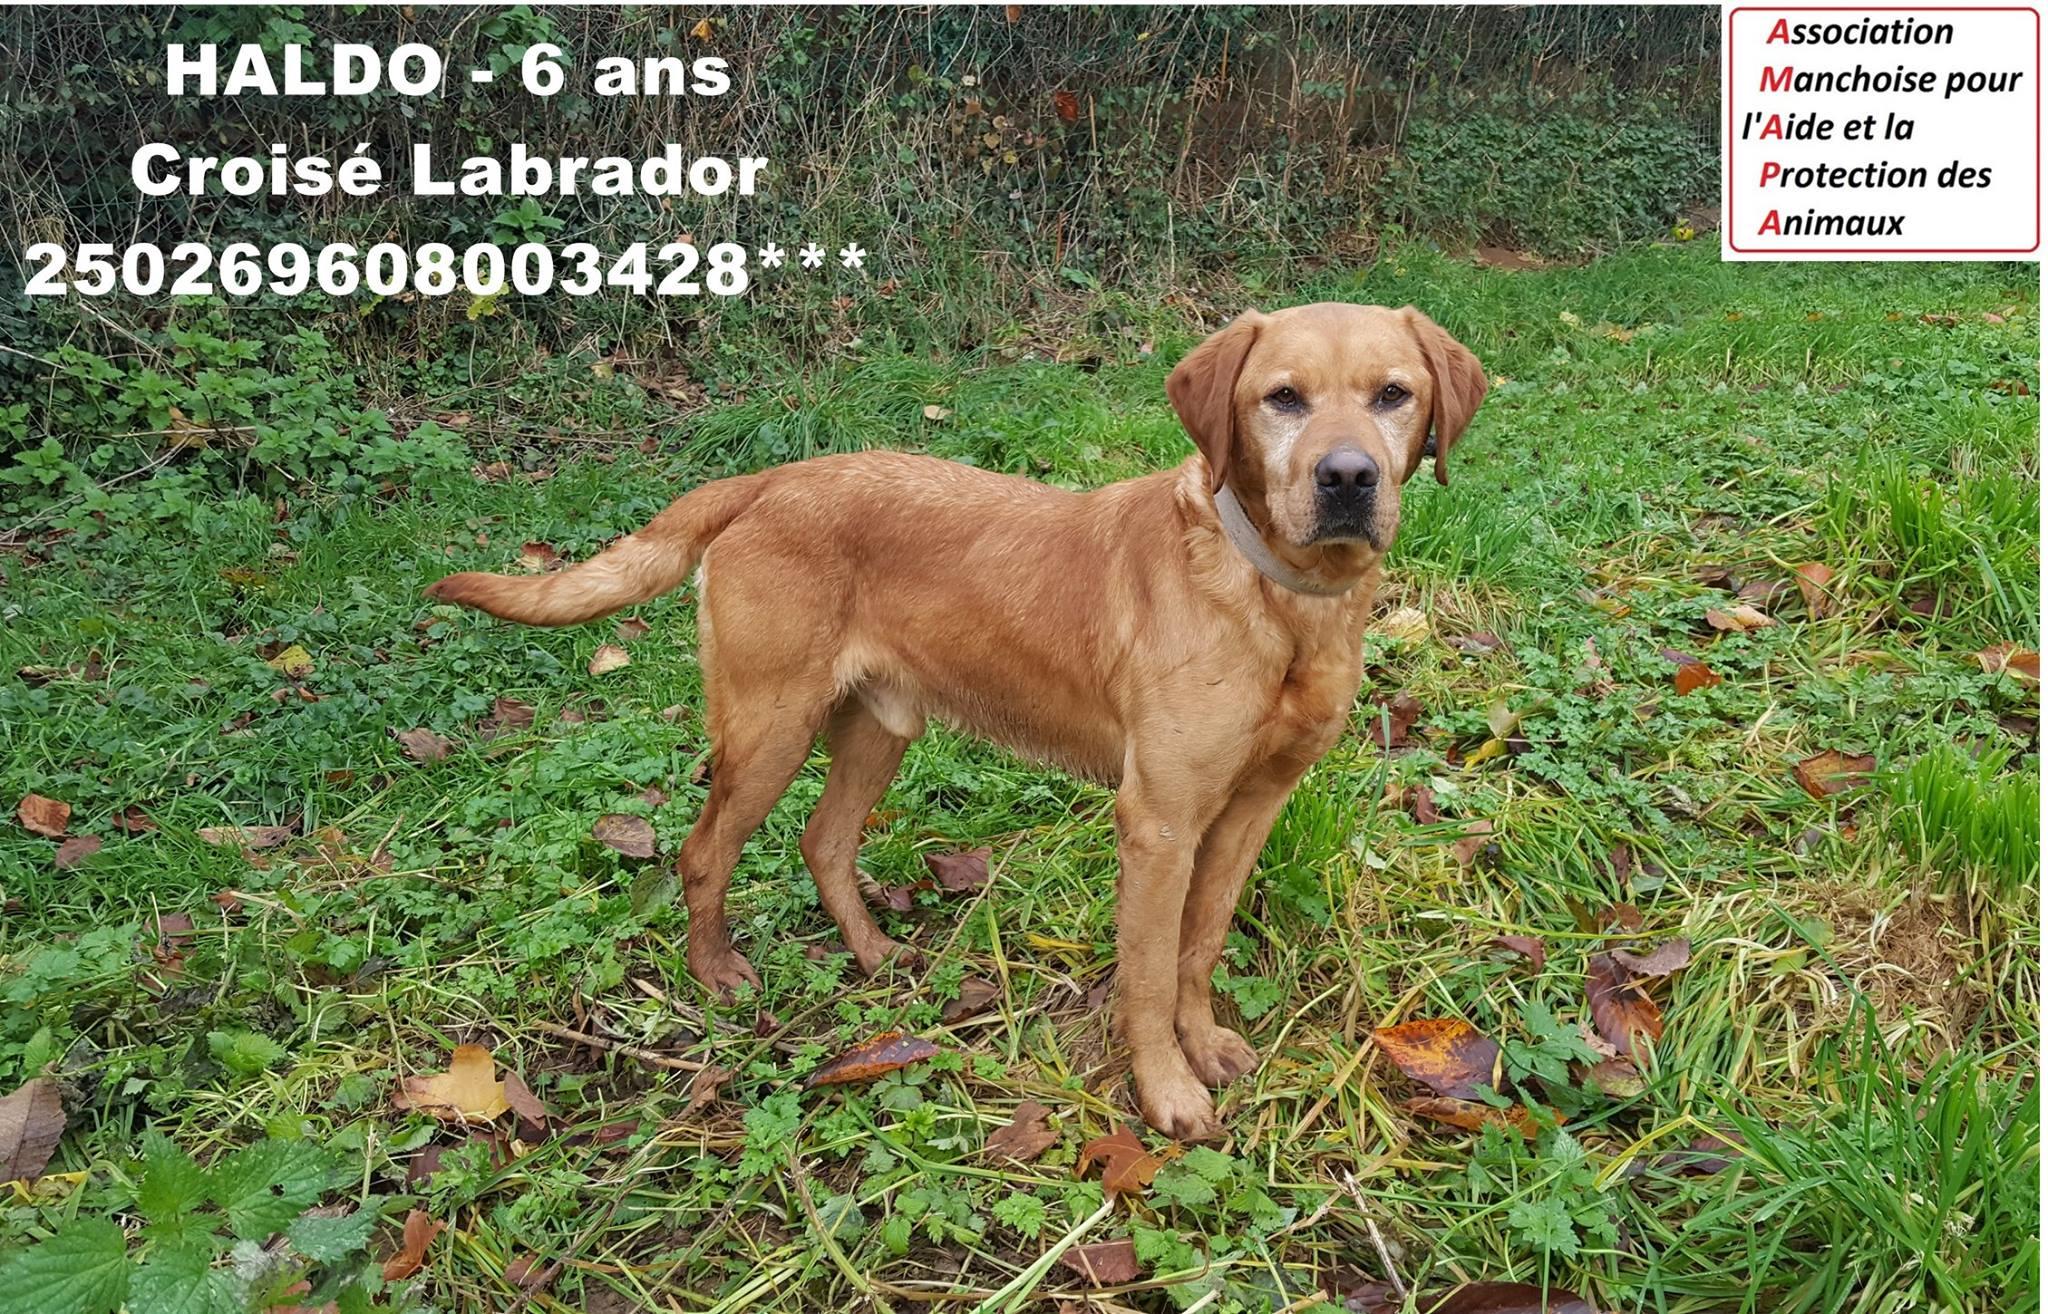 HALDO - x labrador 6 ans - AMAPA à Coutances (50) 5a465138e08ff510736677